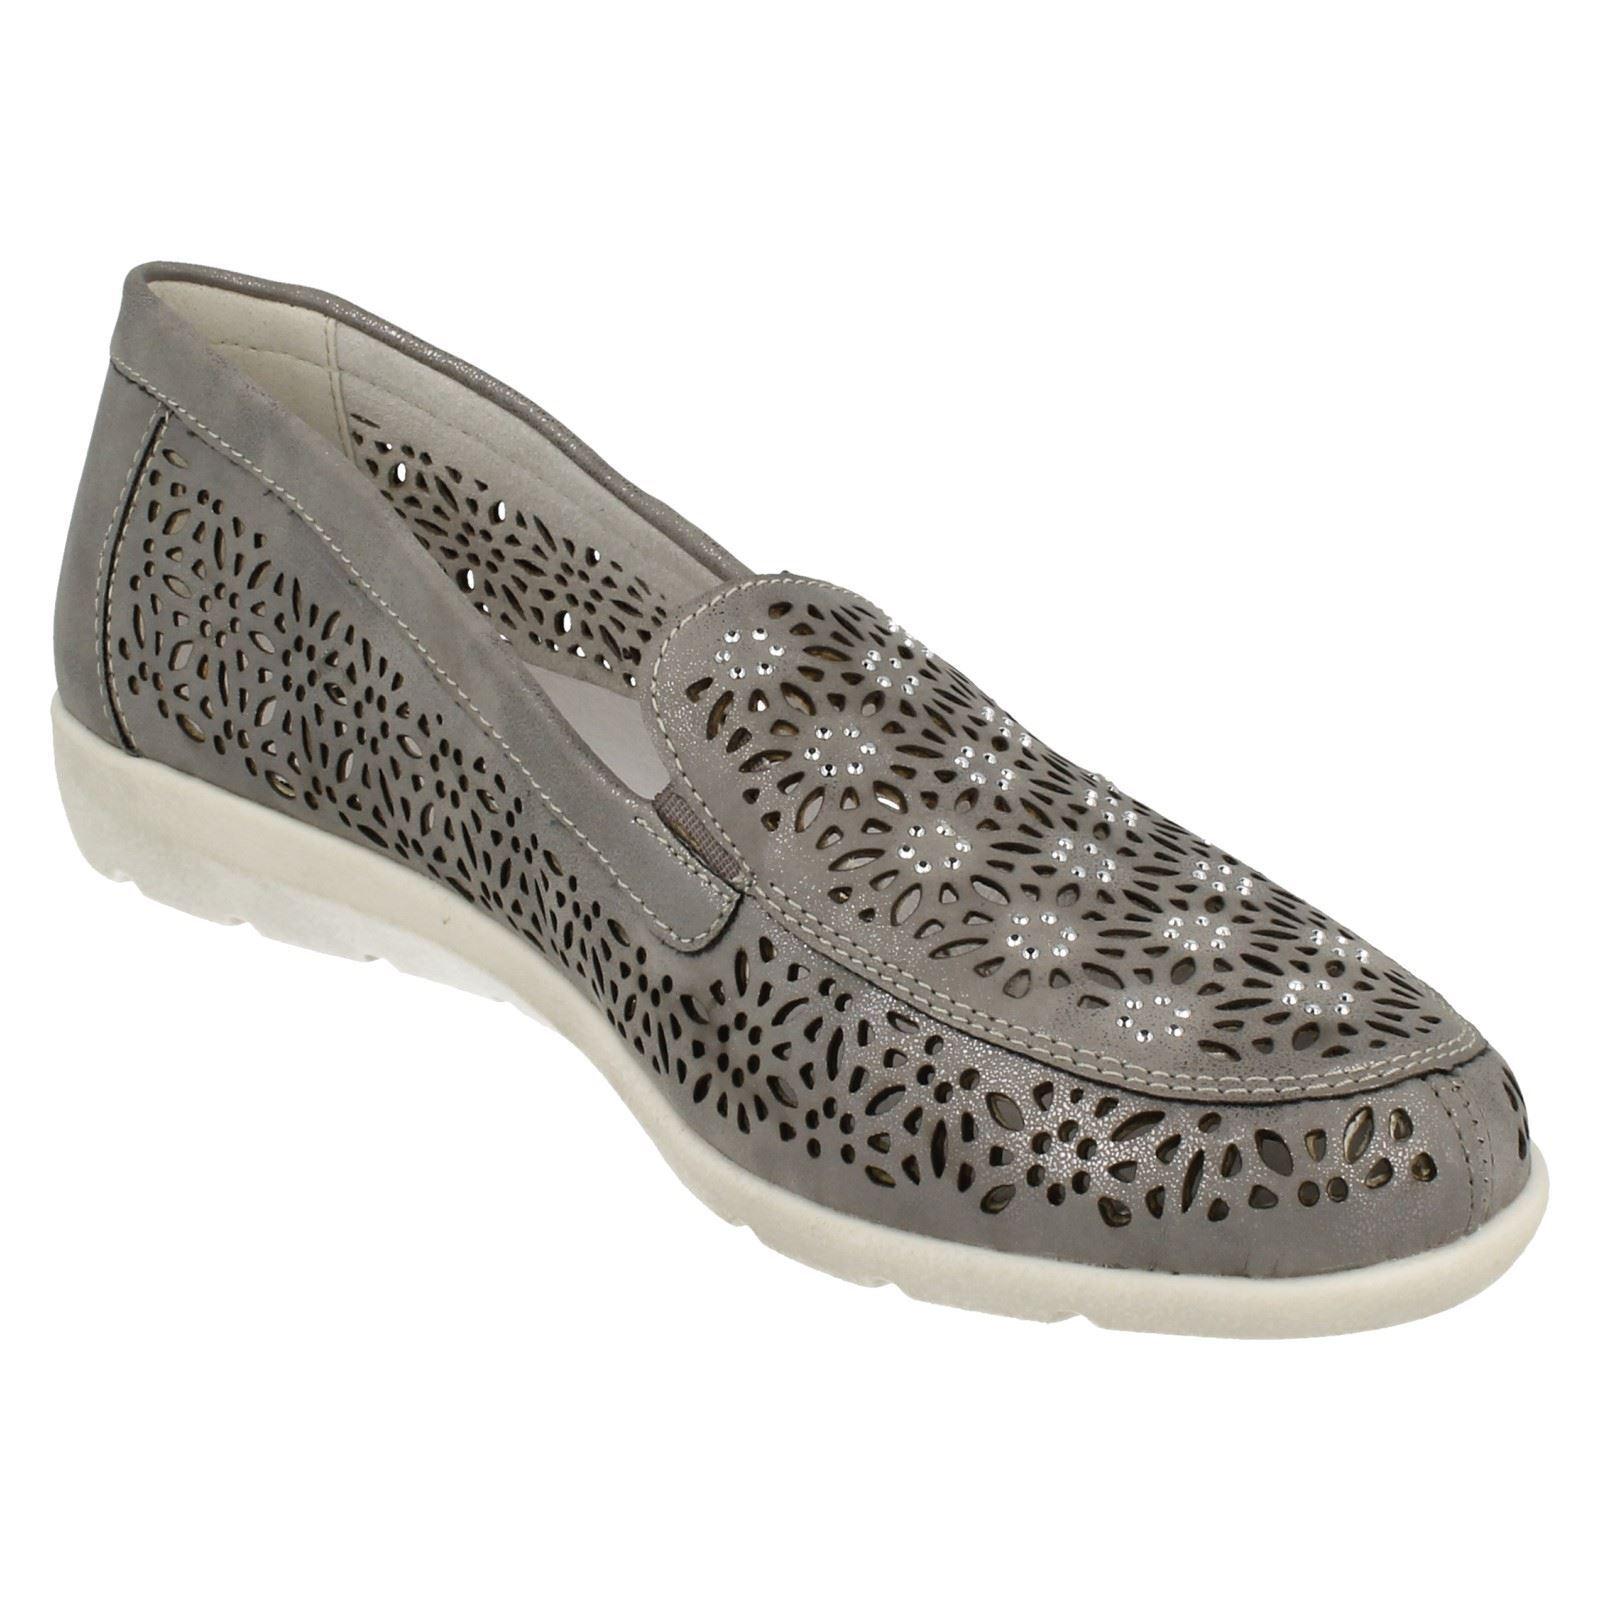 Remonte d1918 Schuhe grau Synthetisch Freizeitslipper Stil Schuhe d1918 f7f05e